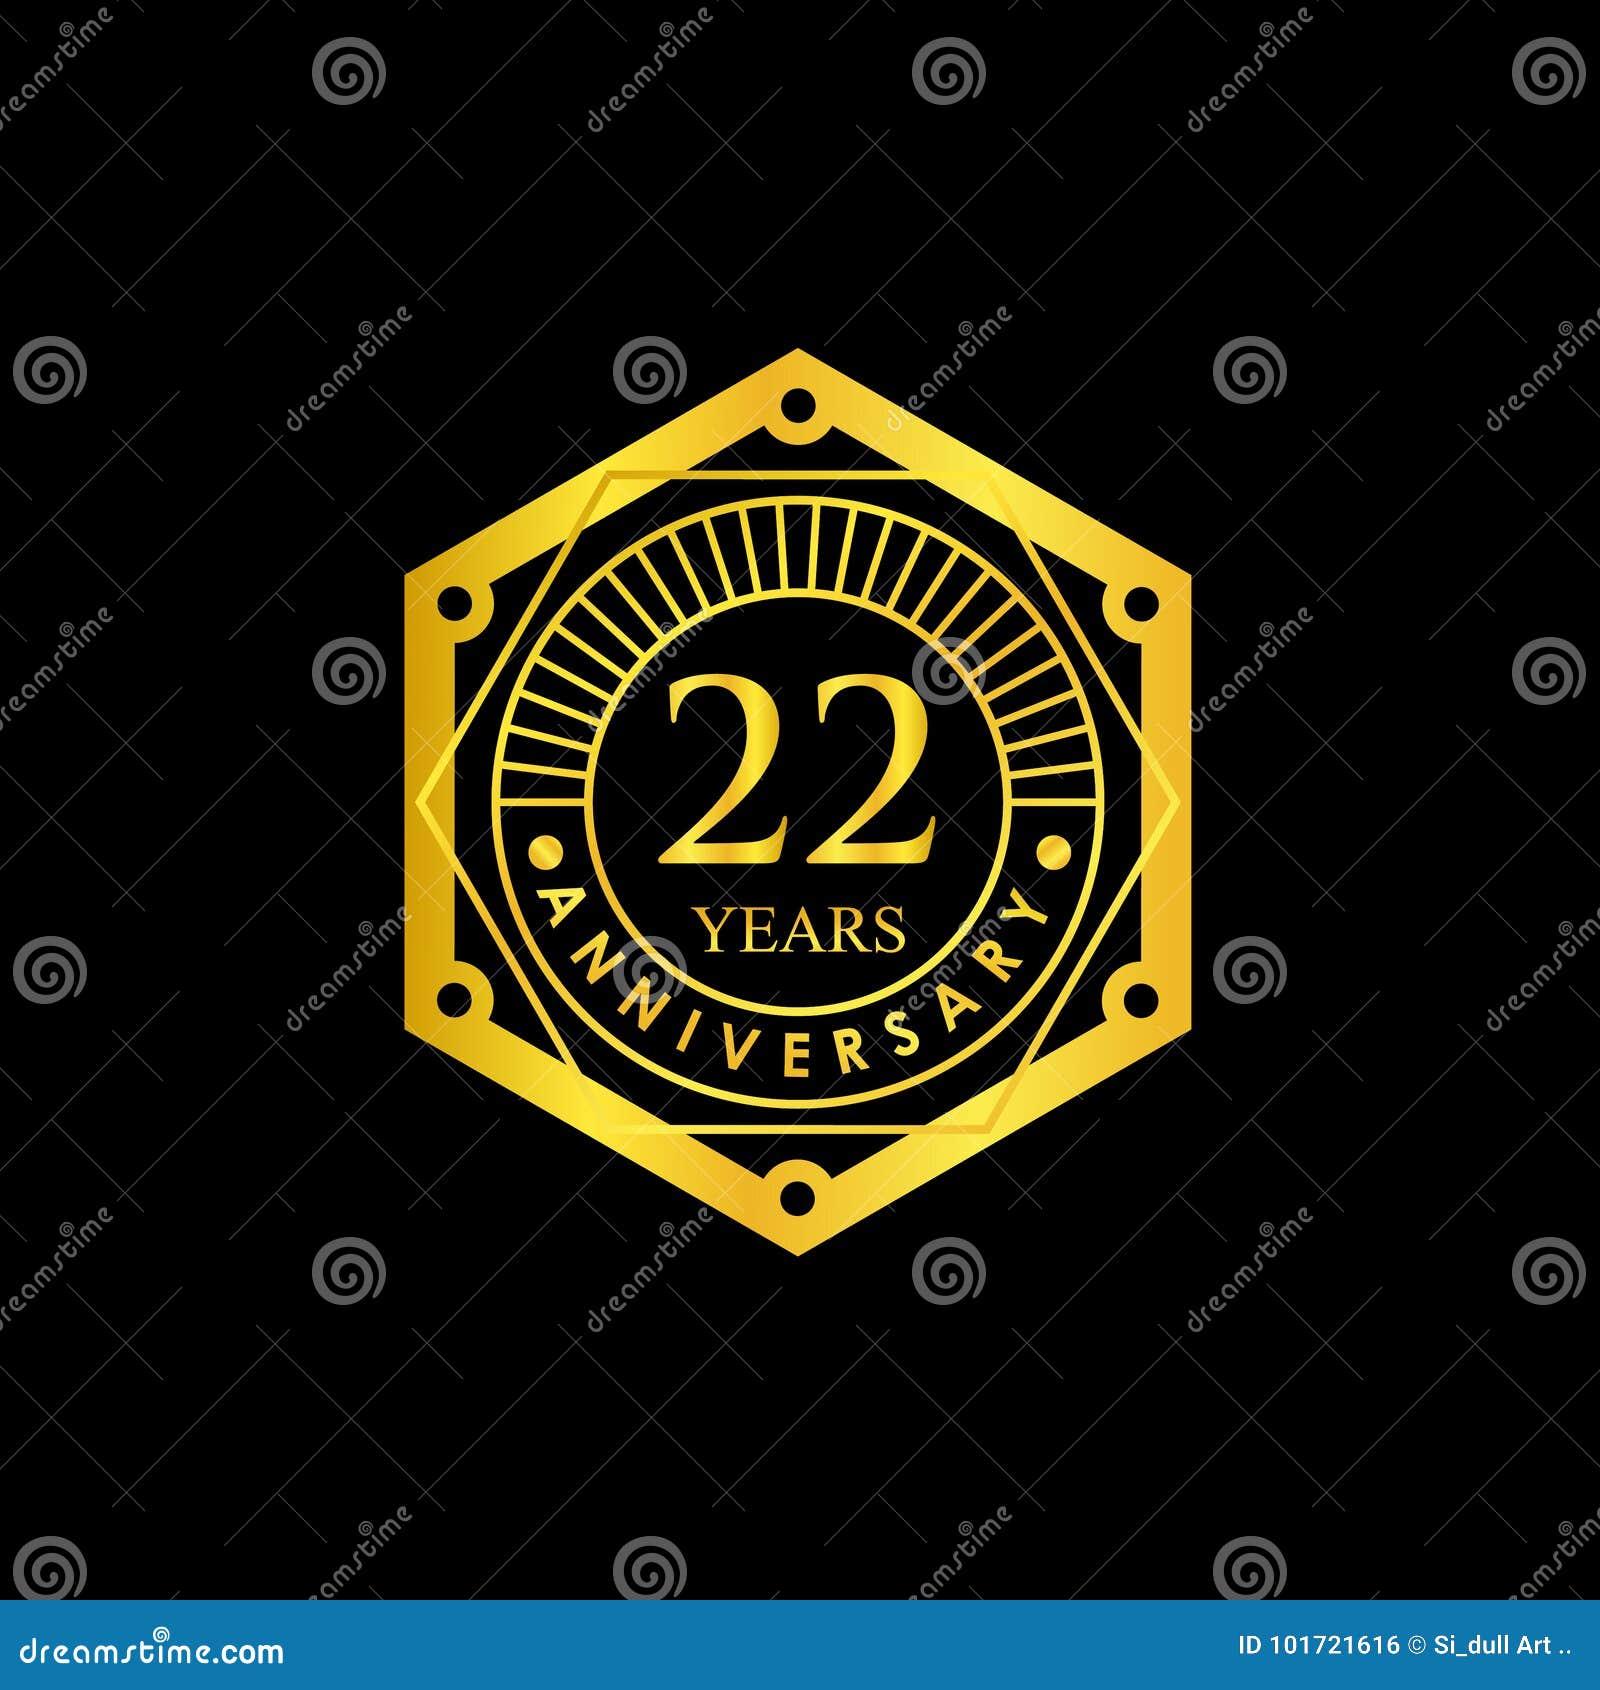 logo badge anniversary black and gold 22 years stock vector